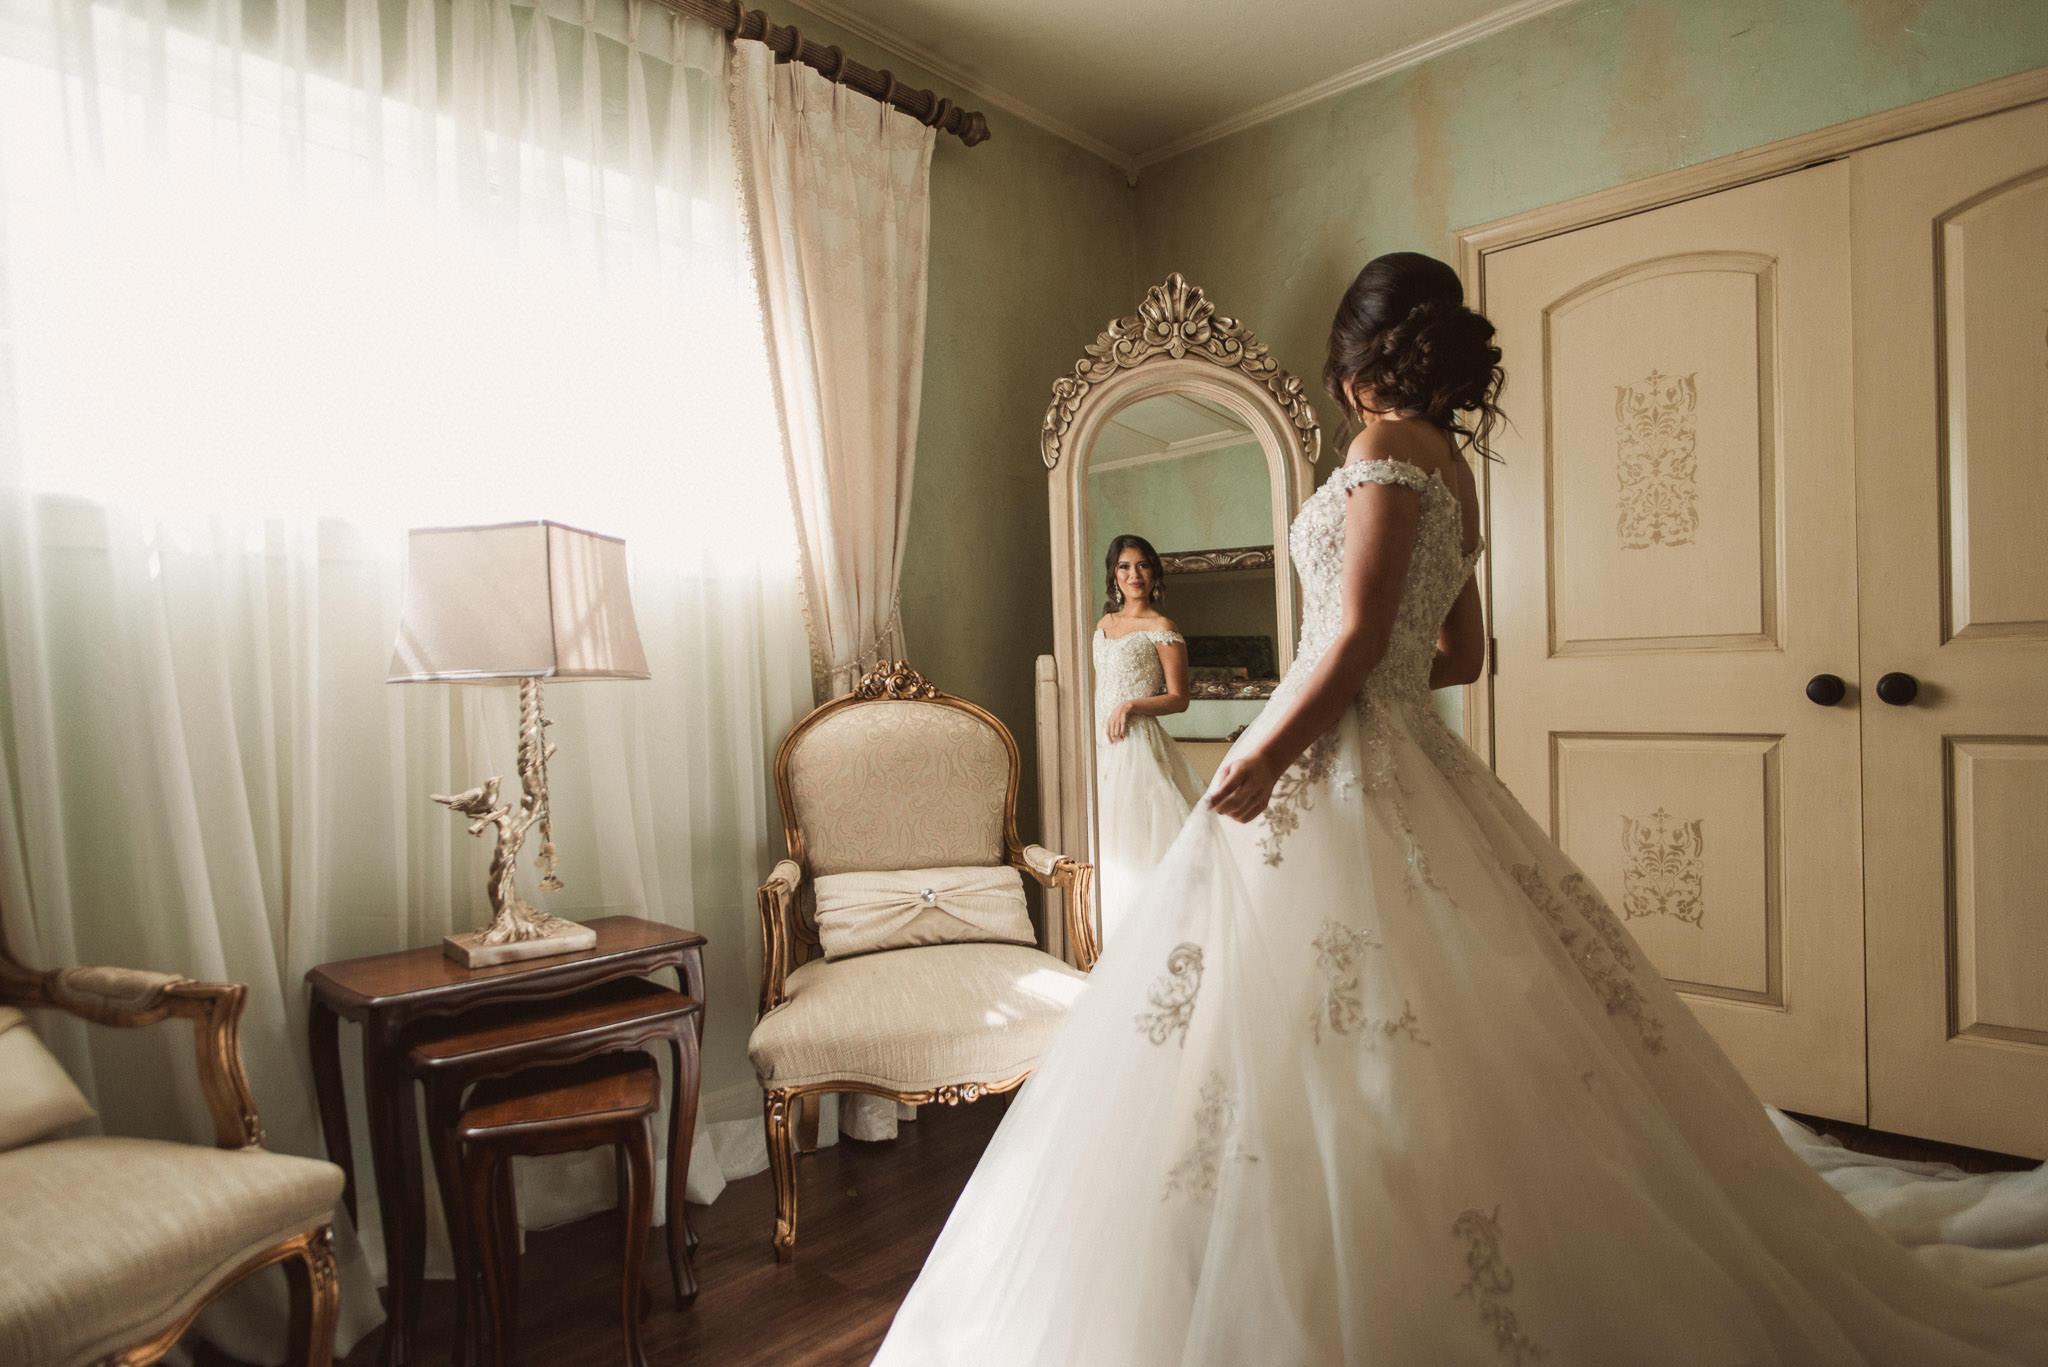 adriana-christian-wedding-re-sm-40.jpg